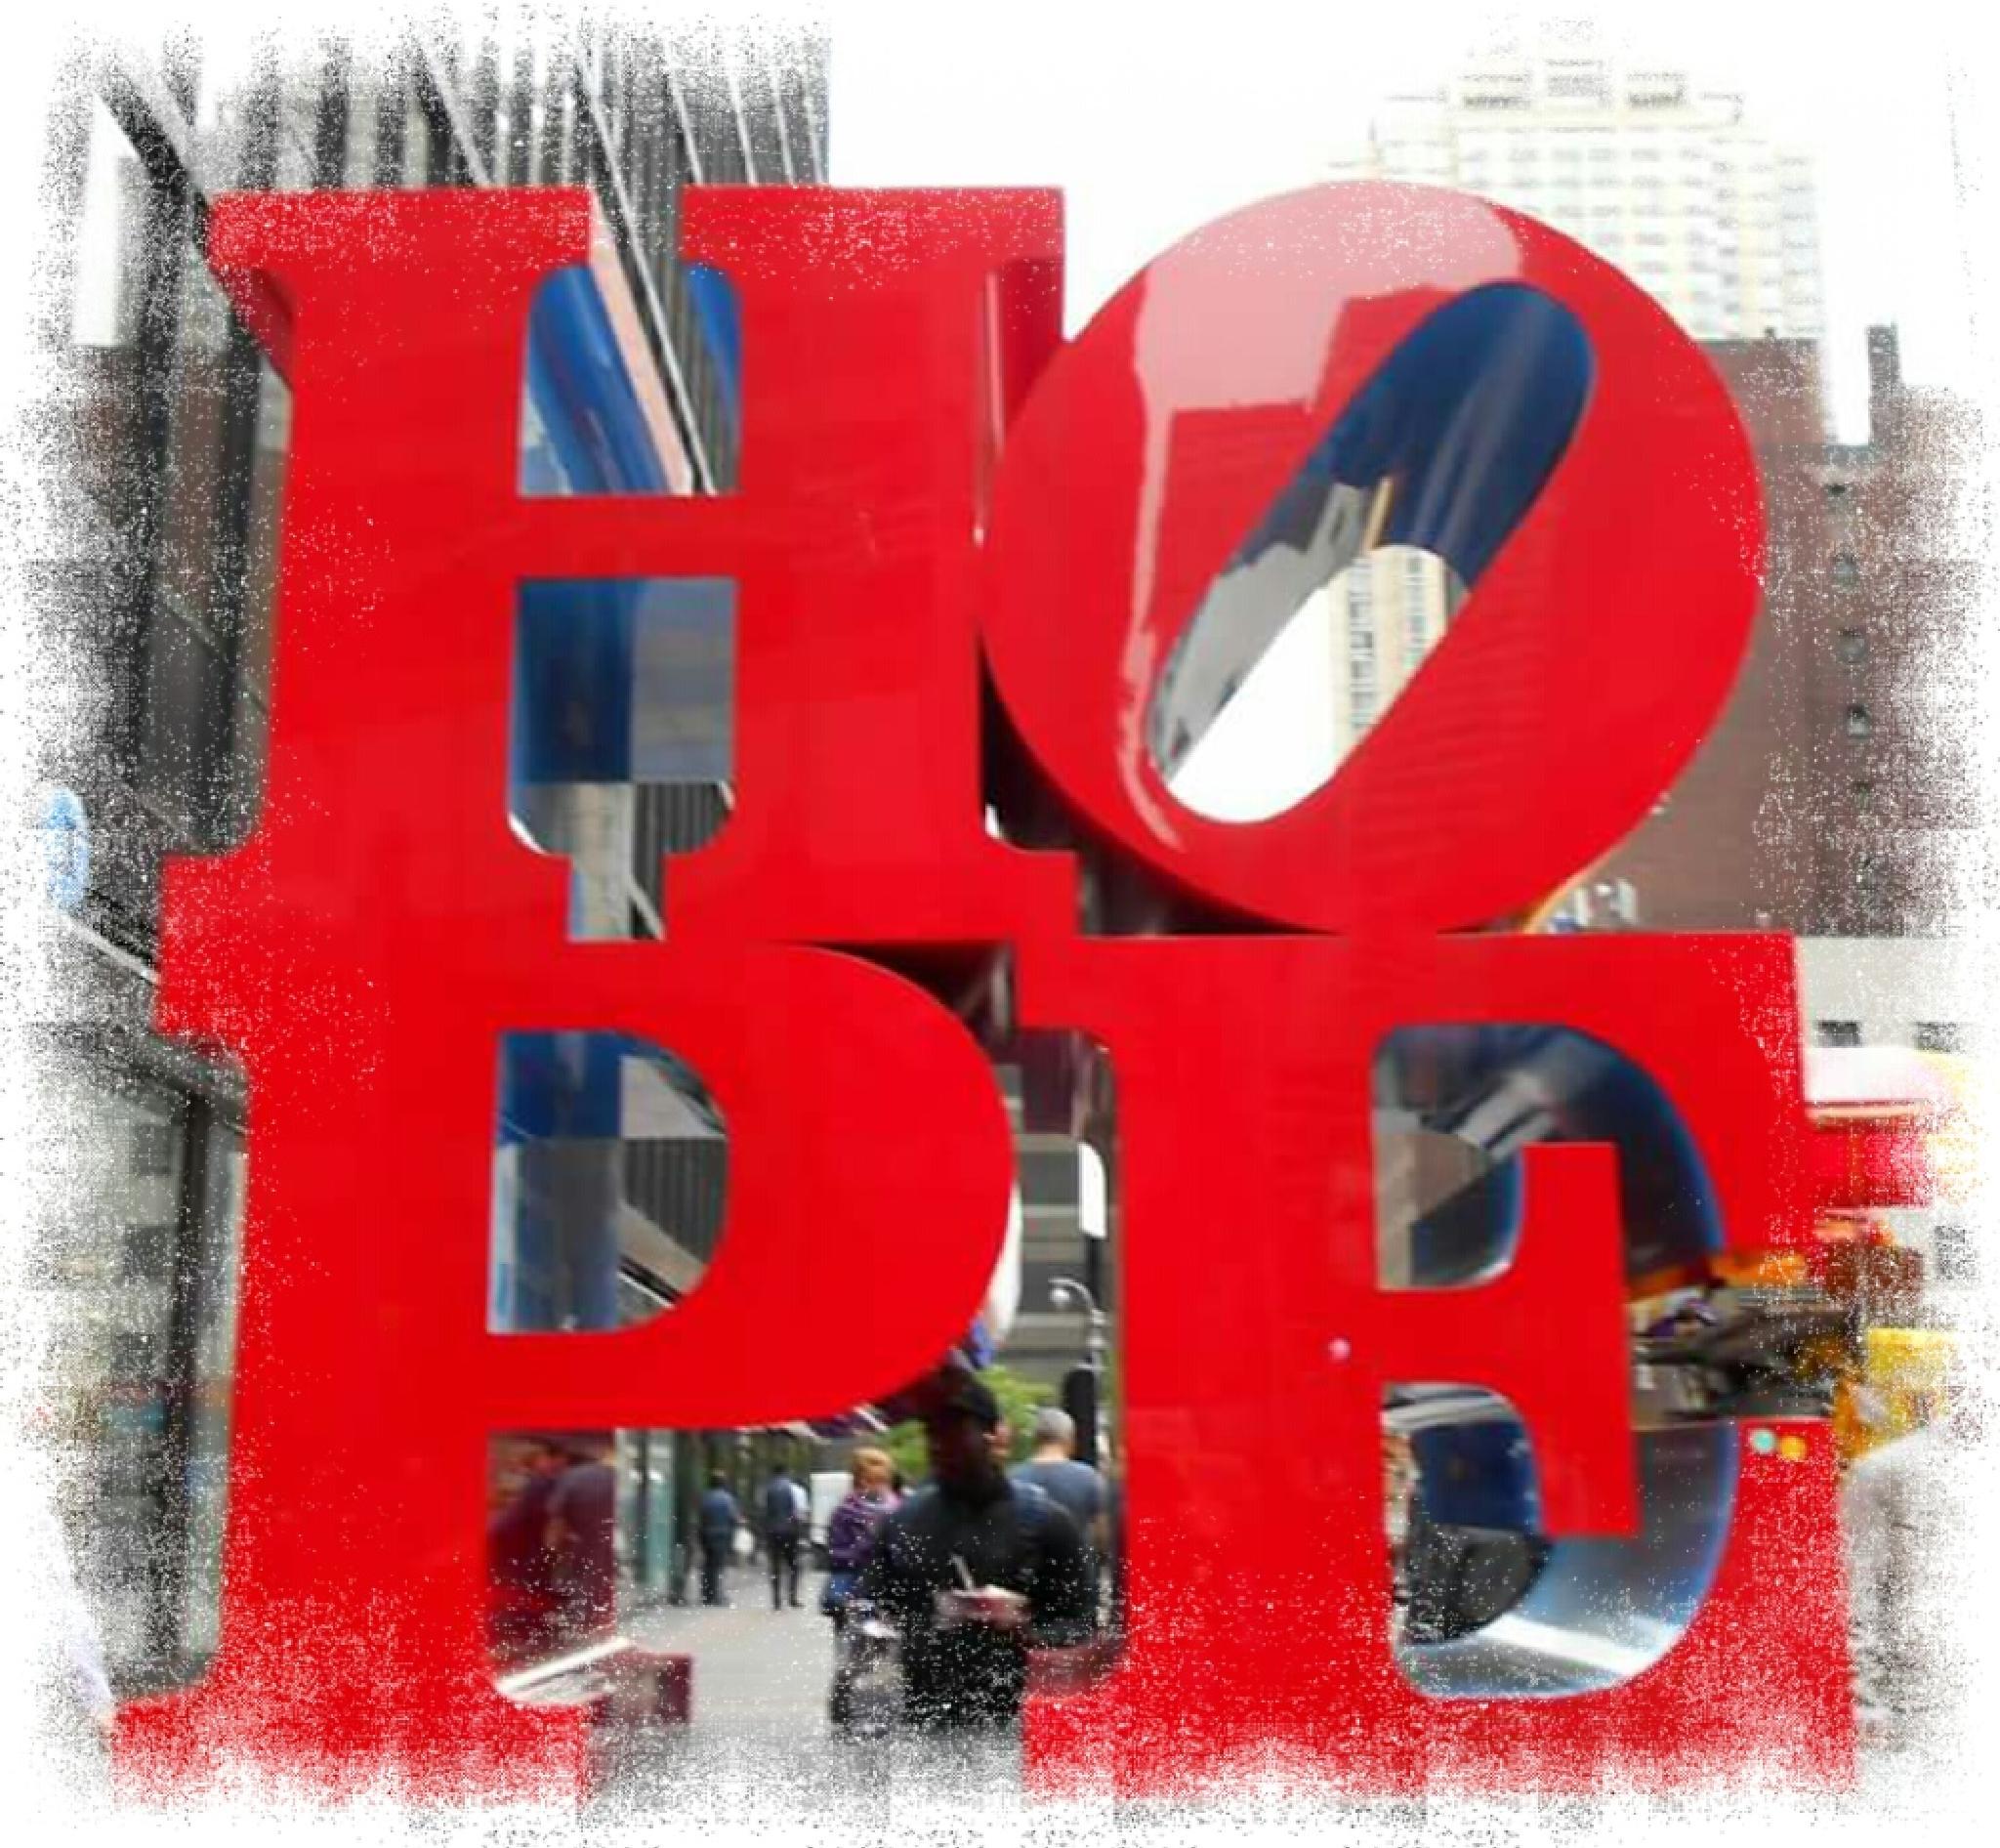 New York HOPE  by tramilo